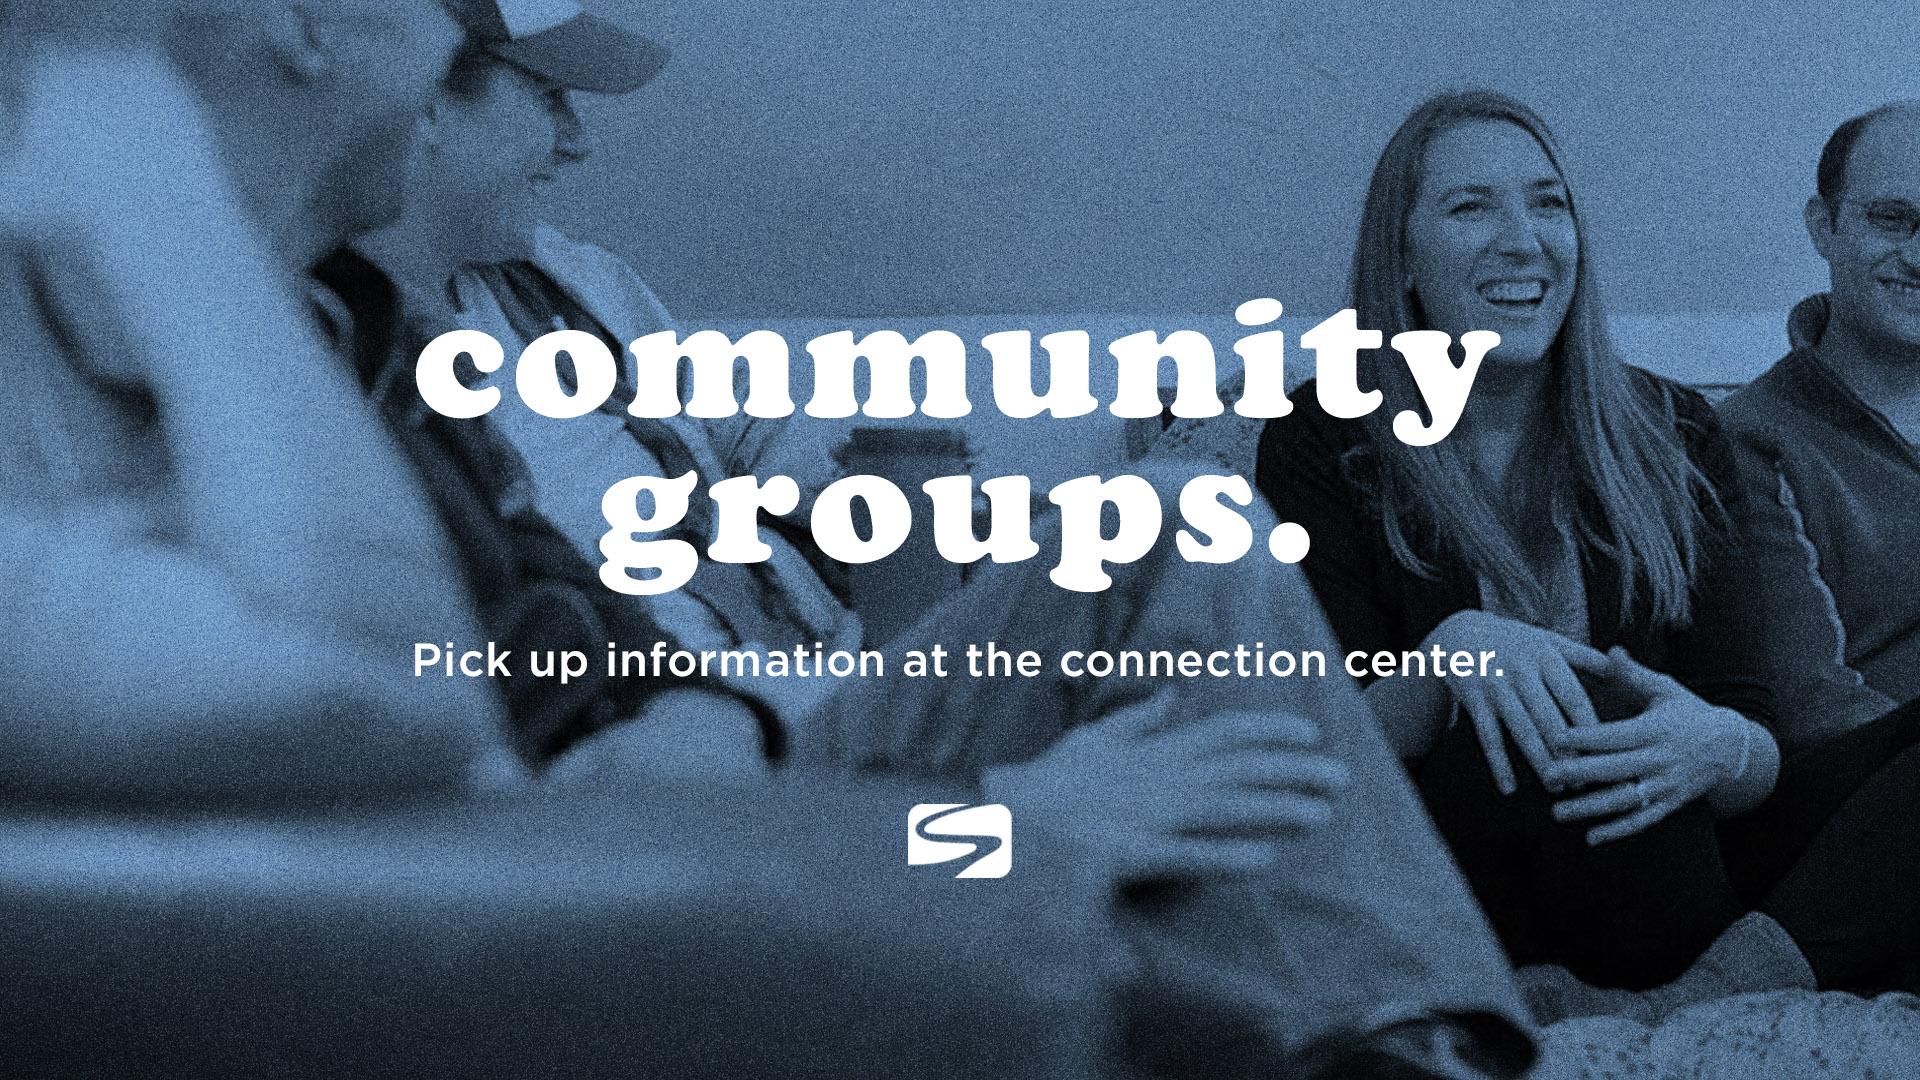 CommunityGroups_1920x1080.jpg